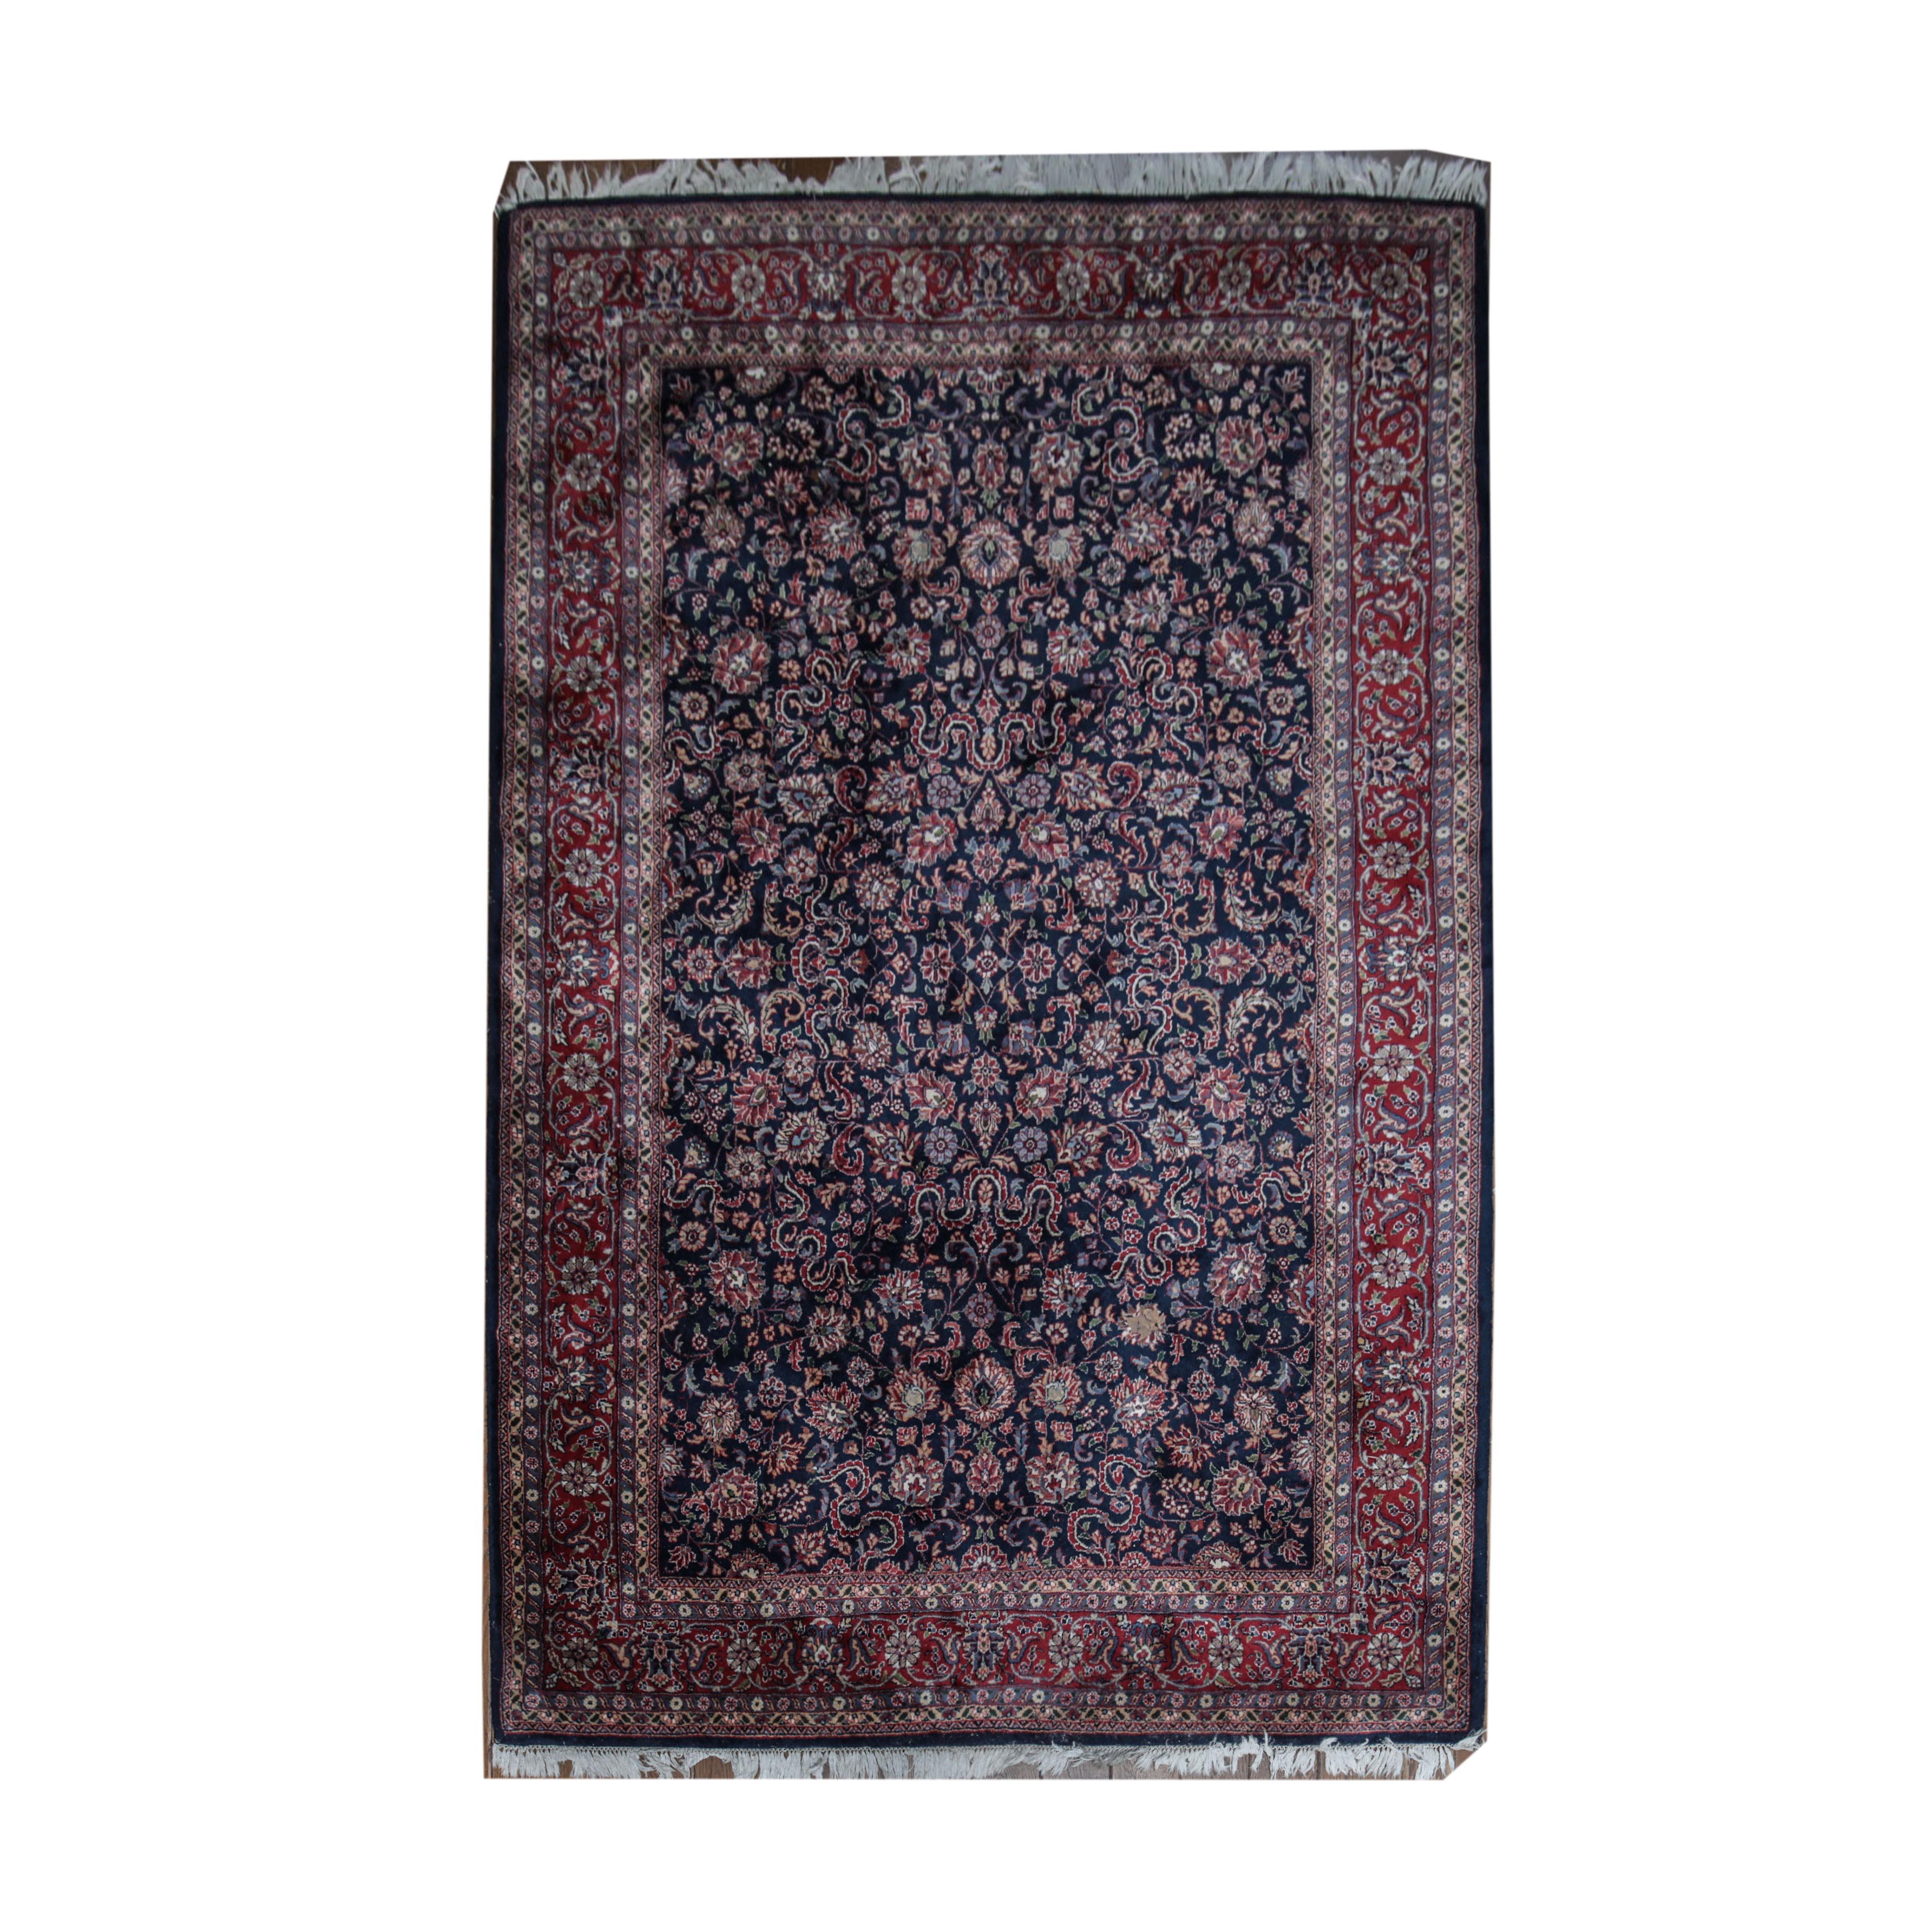 Handwoven Persian Wool Rug